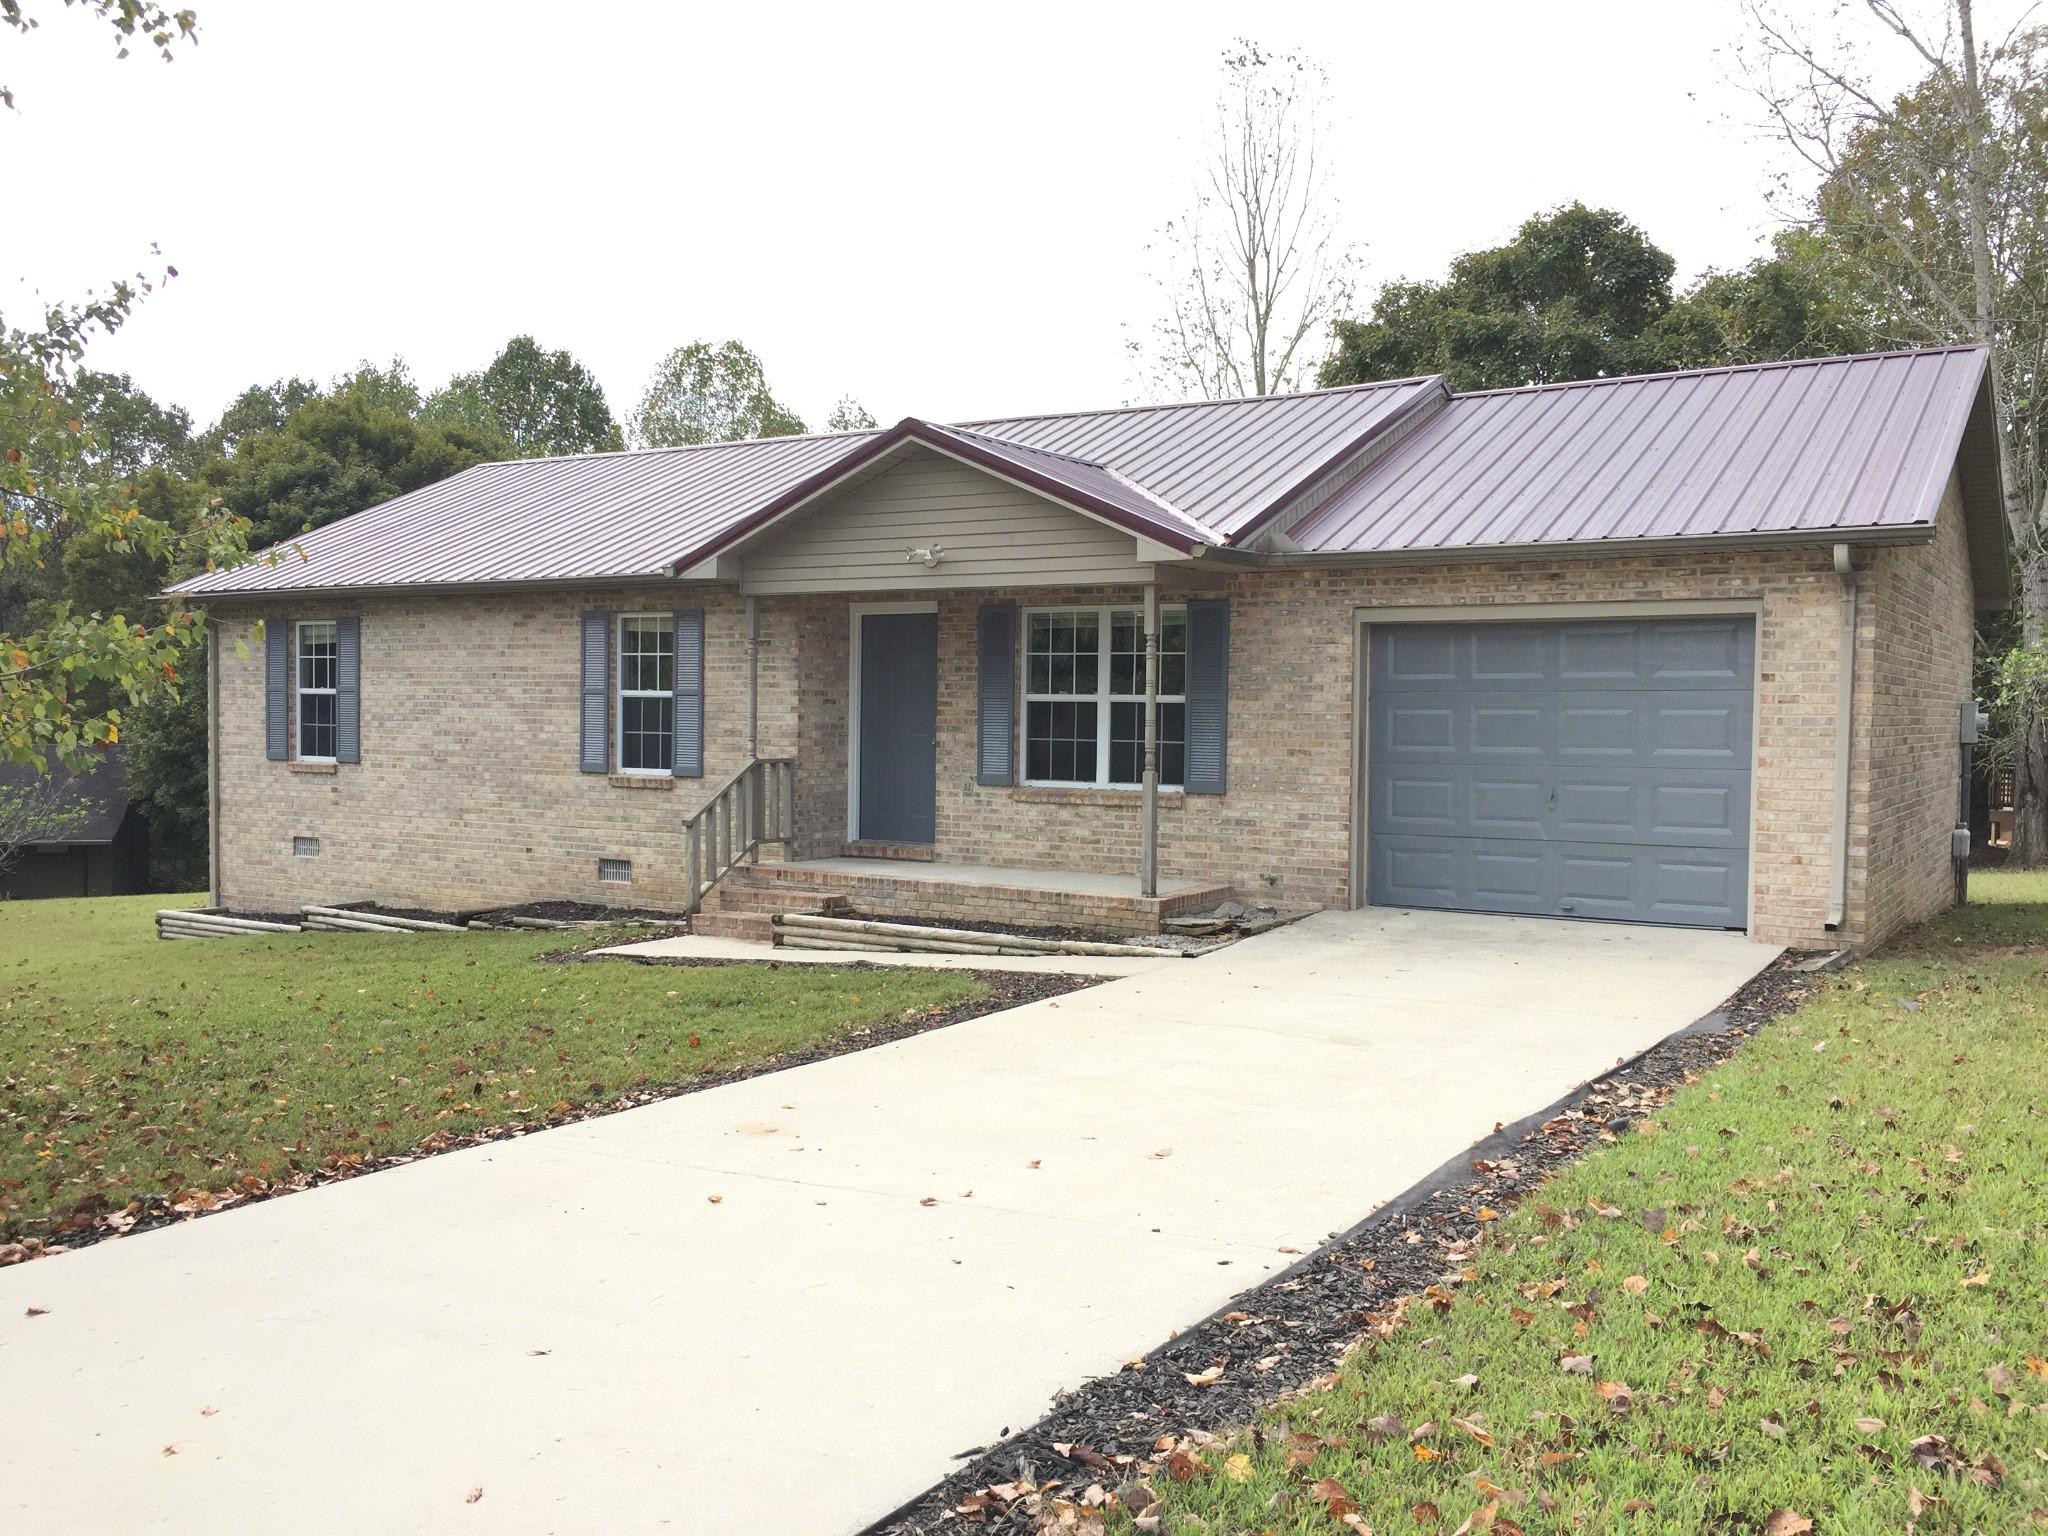 106 Walnut Dr, Winchester, TN 37398 - Winchester, TN real estate listing